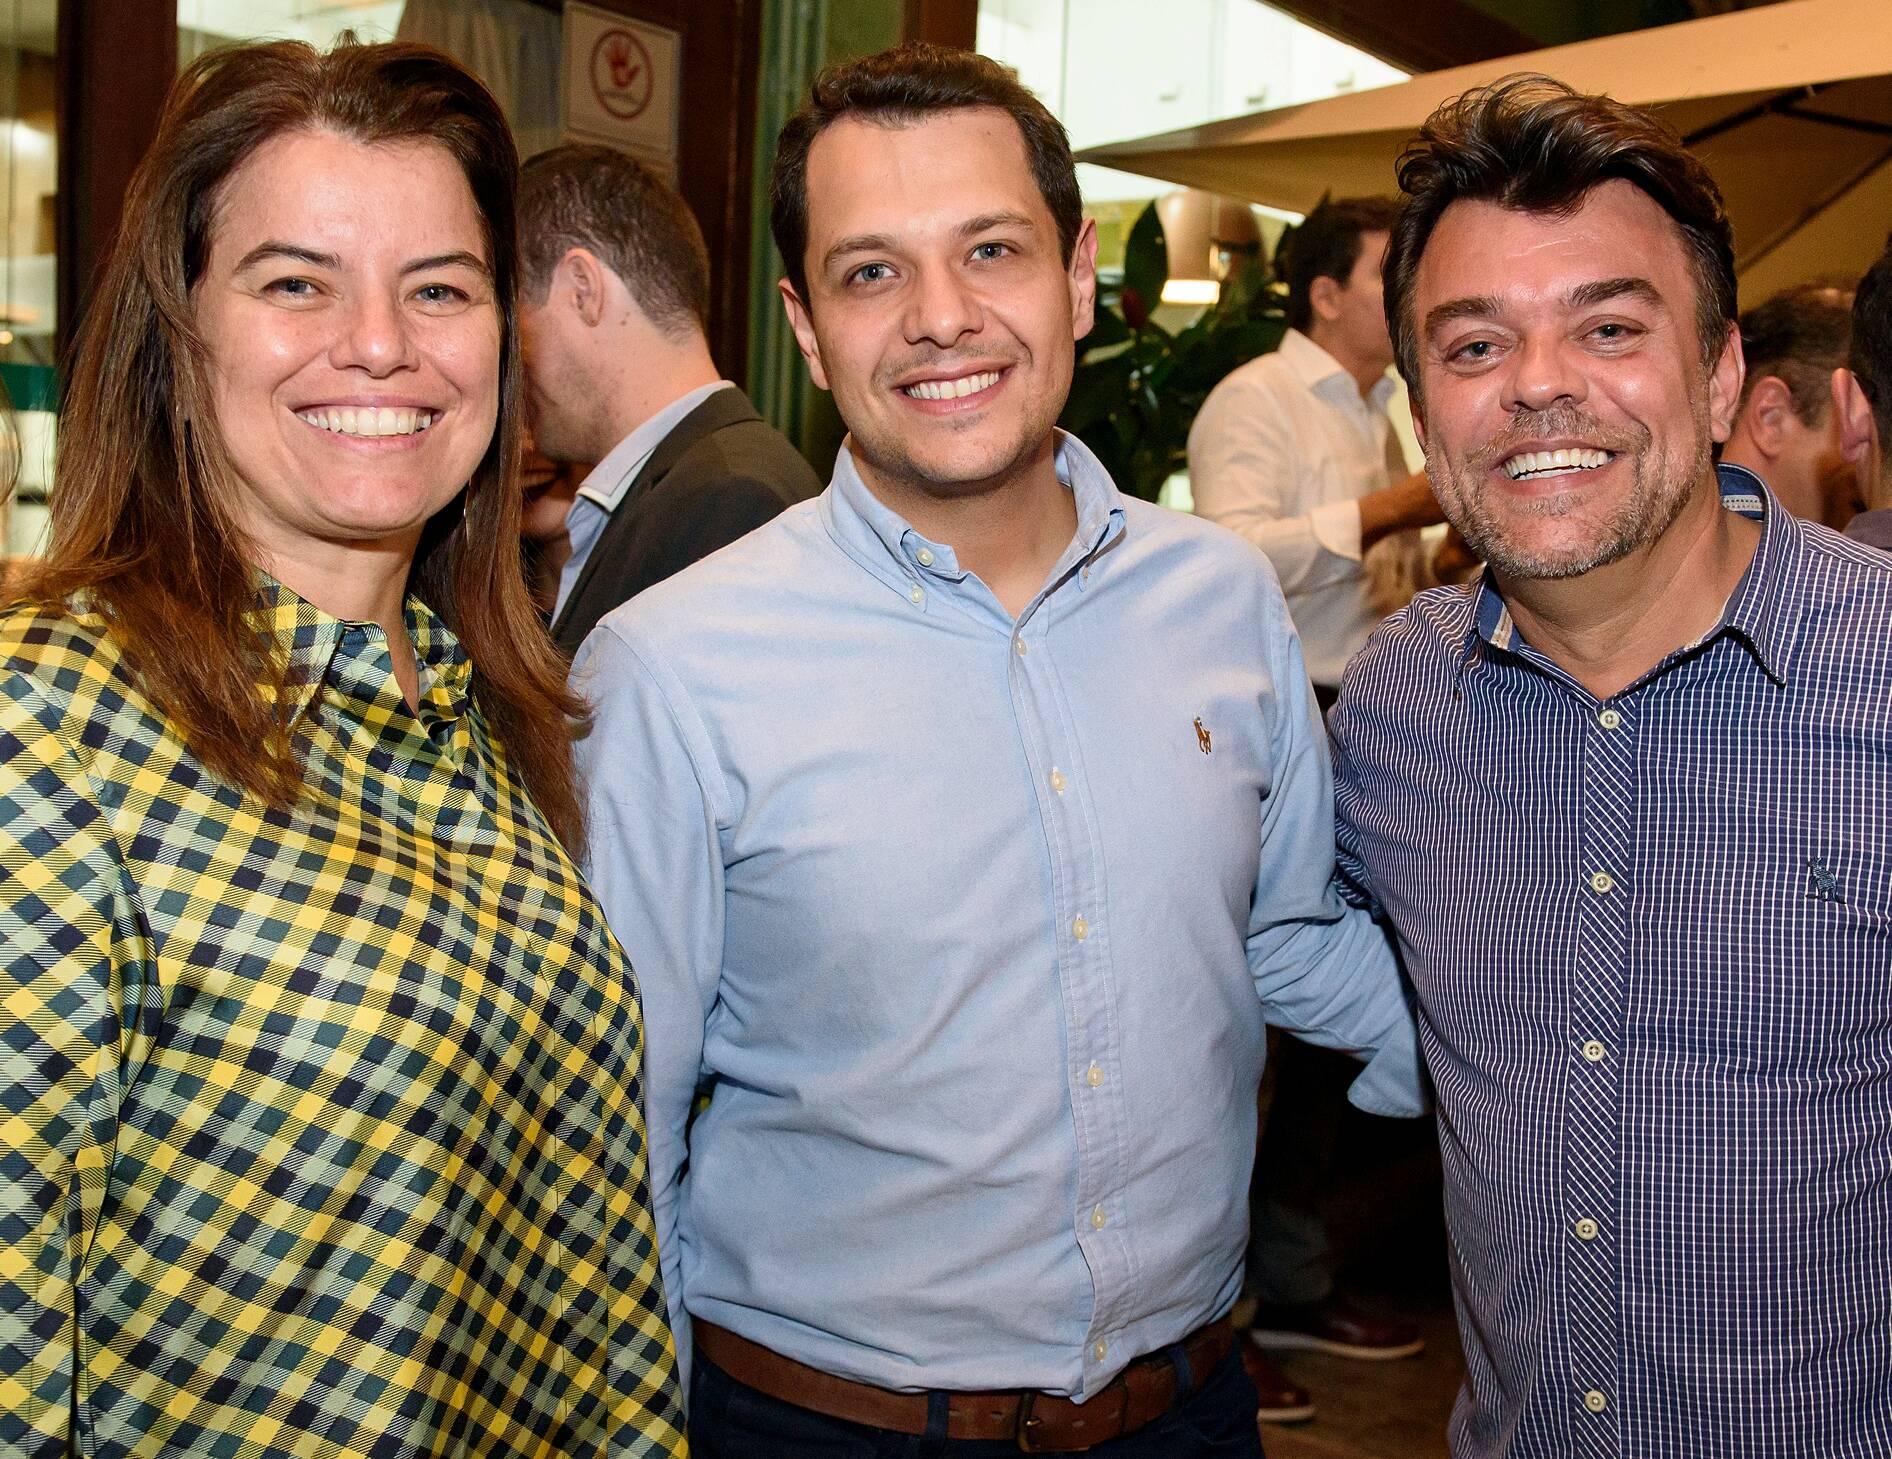 Paula Costa, Guilherme Martins, Ulysses Jayme / Foto: RicaLucas